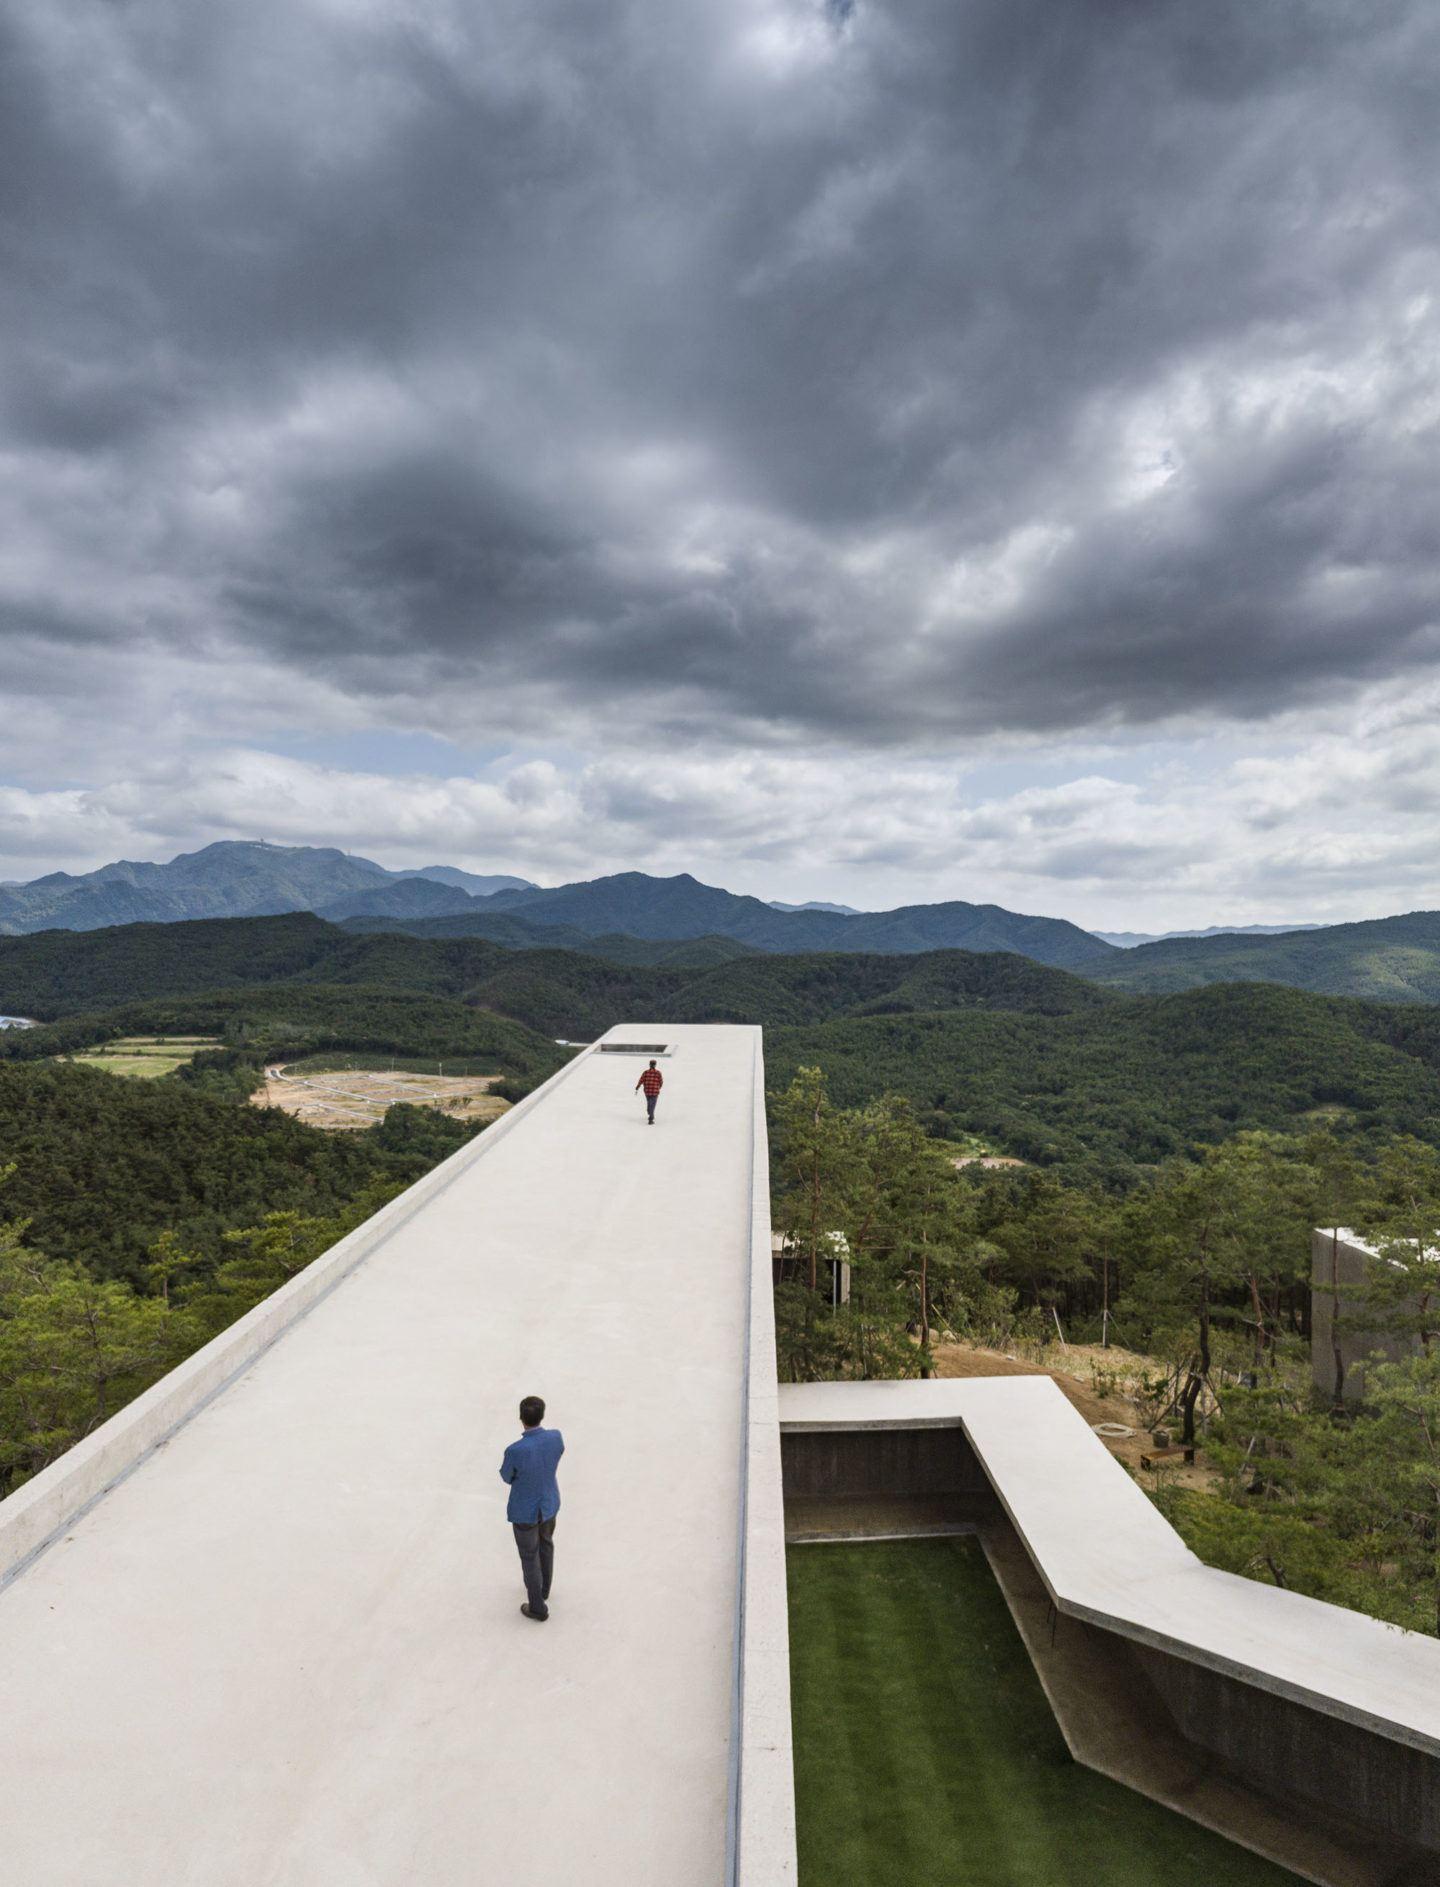 IGNANT-Architecture-Alvaro-Siza-Carlos-Castanheira-Art-Pavilion-Photographs-26